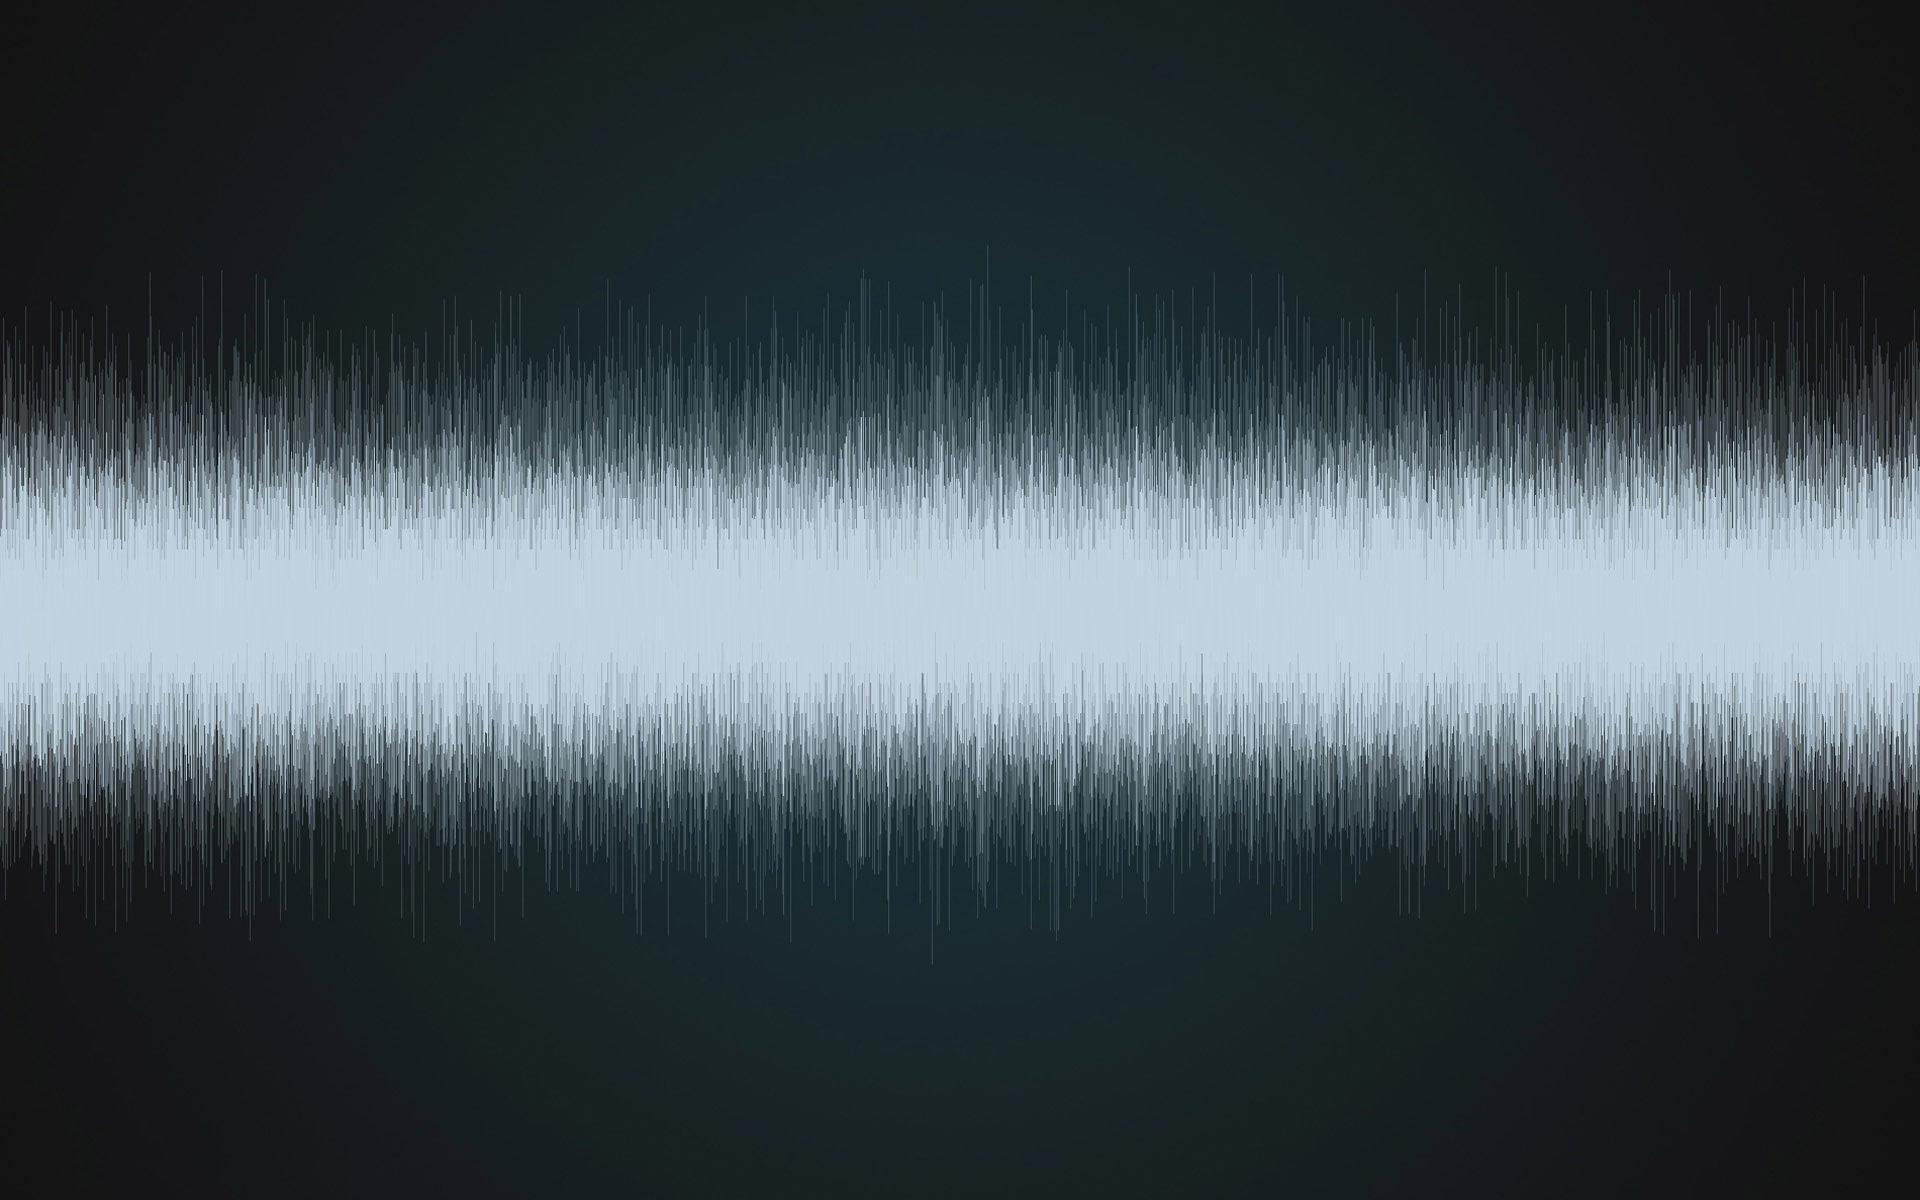 Hipster Fall Wallpaper Download Free Sound Wave Backgrounds Pixelstalk Net